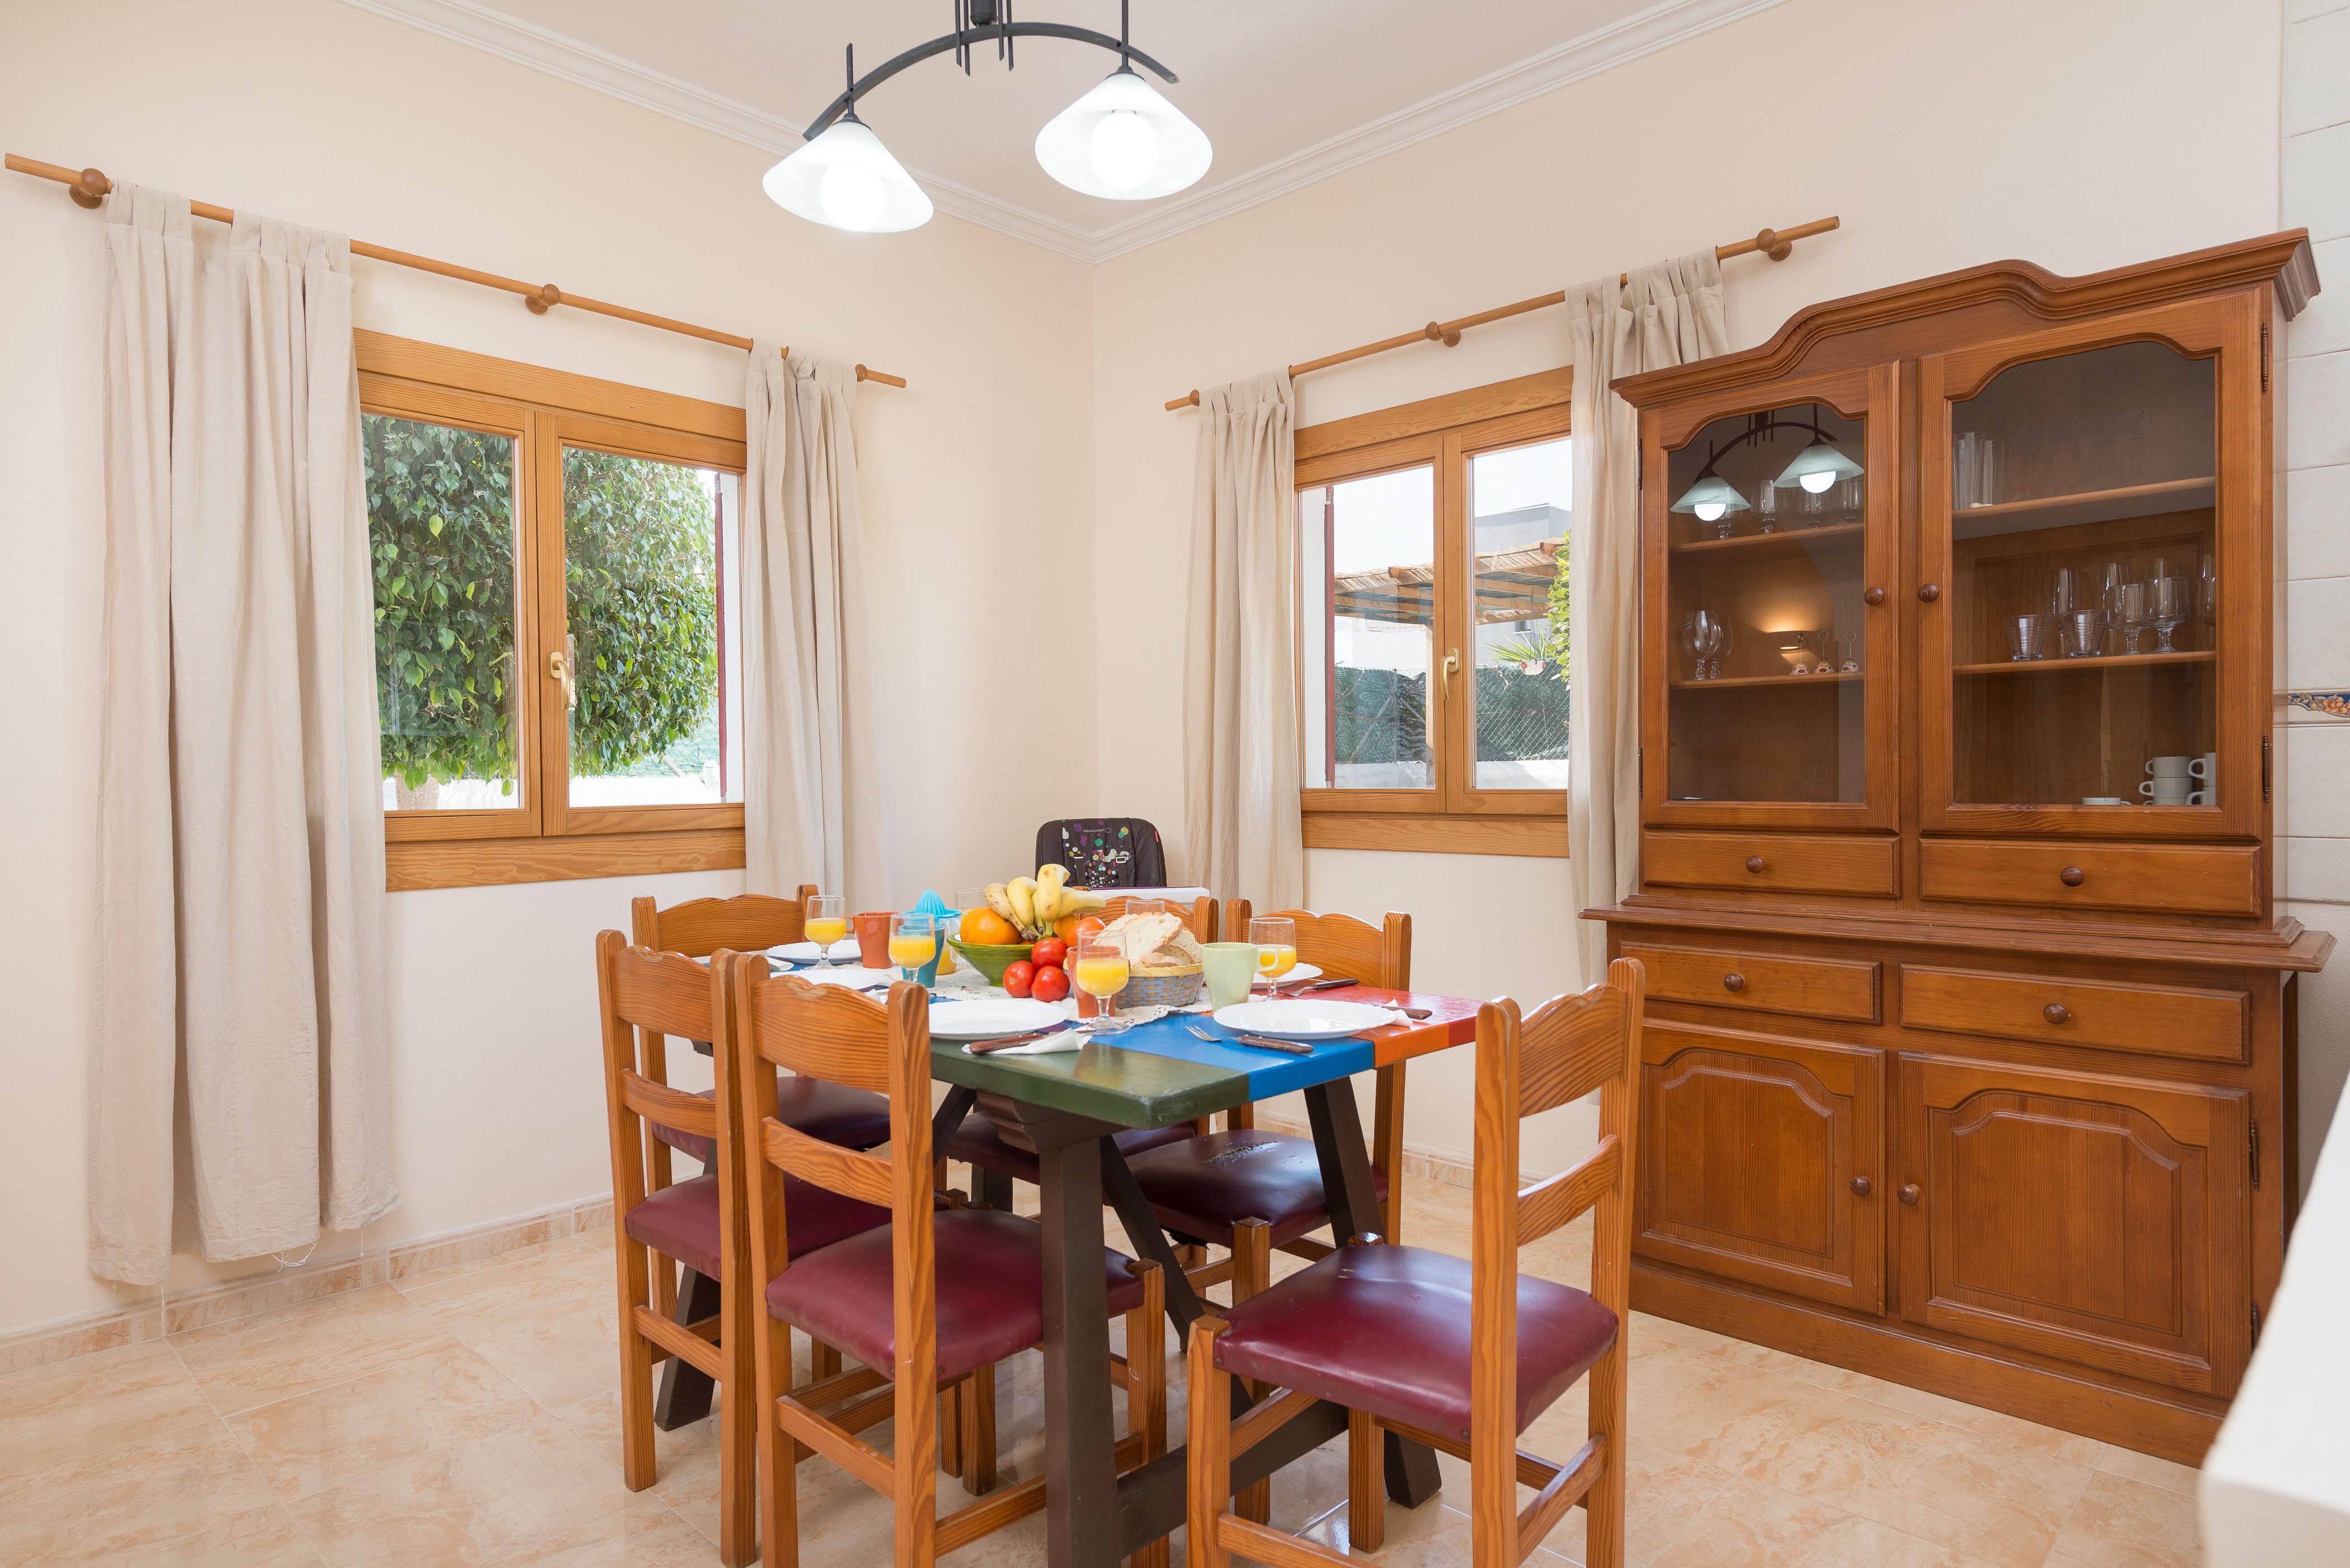 Ferienhaus CAN MOLINA (2063640), Cala Mandia, Mallorca, Balearische Inseln, Spanien, Bild 17